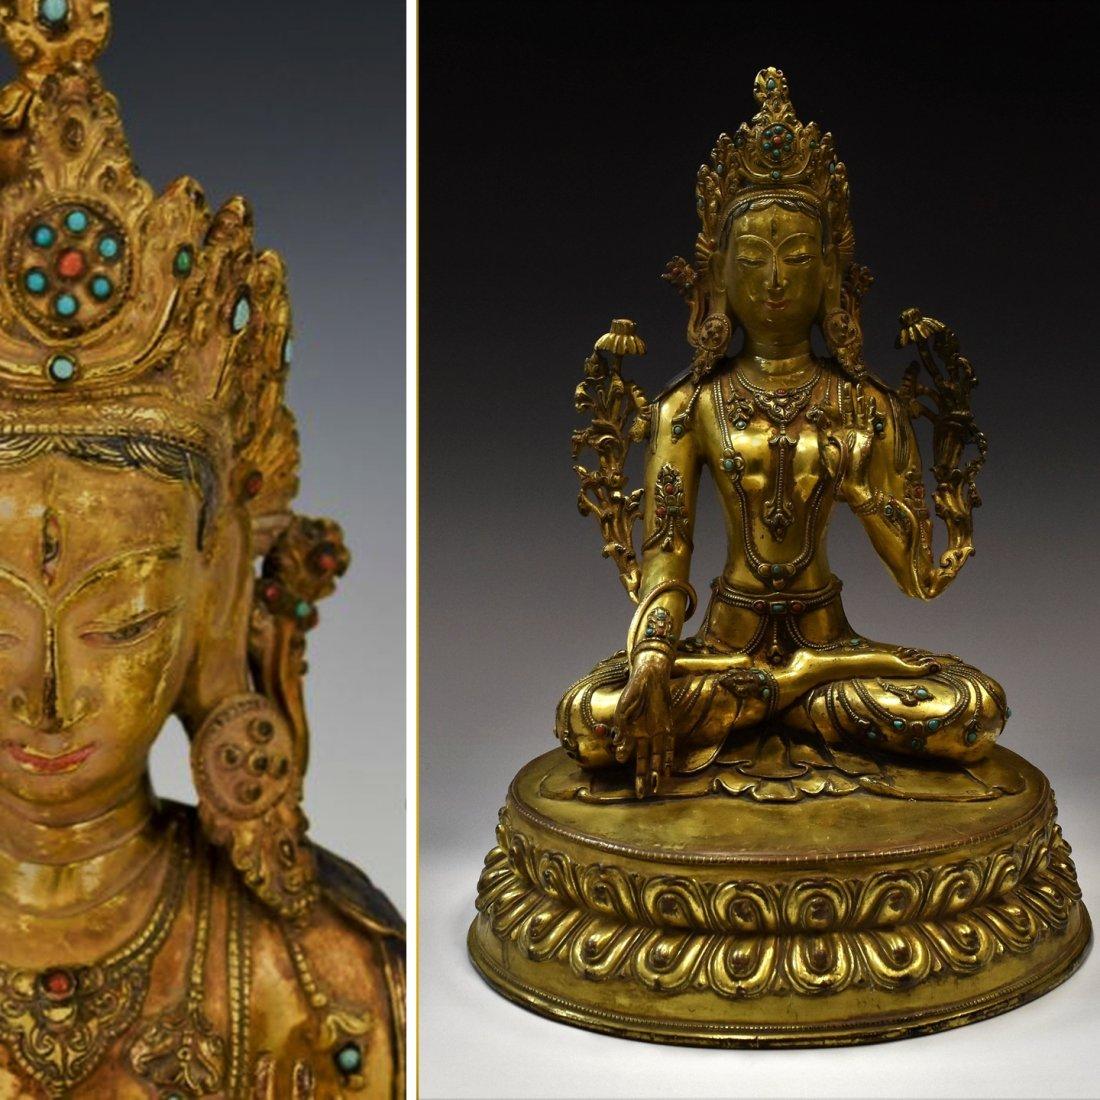 LARGE QING DYNASTY GILT BRONZE INLAID BUDDHA FIGURE